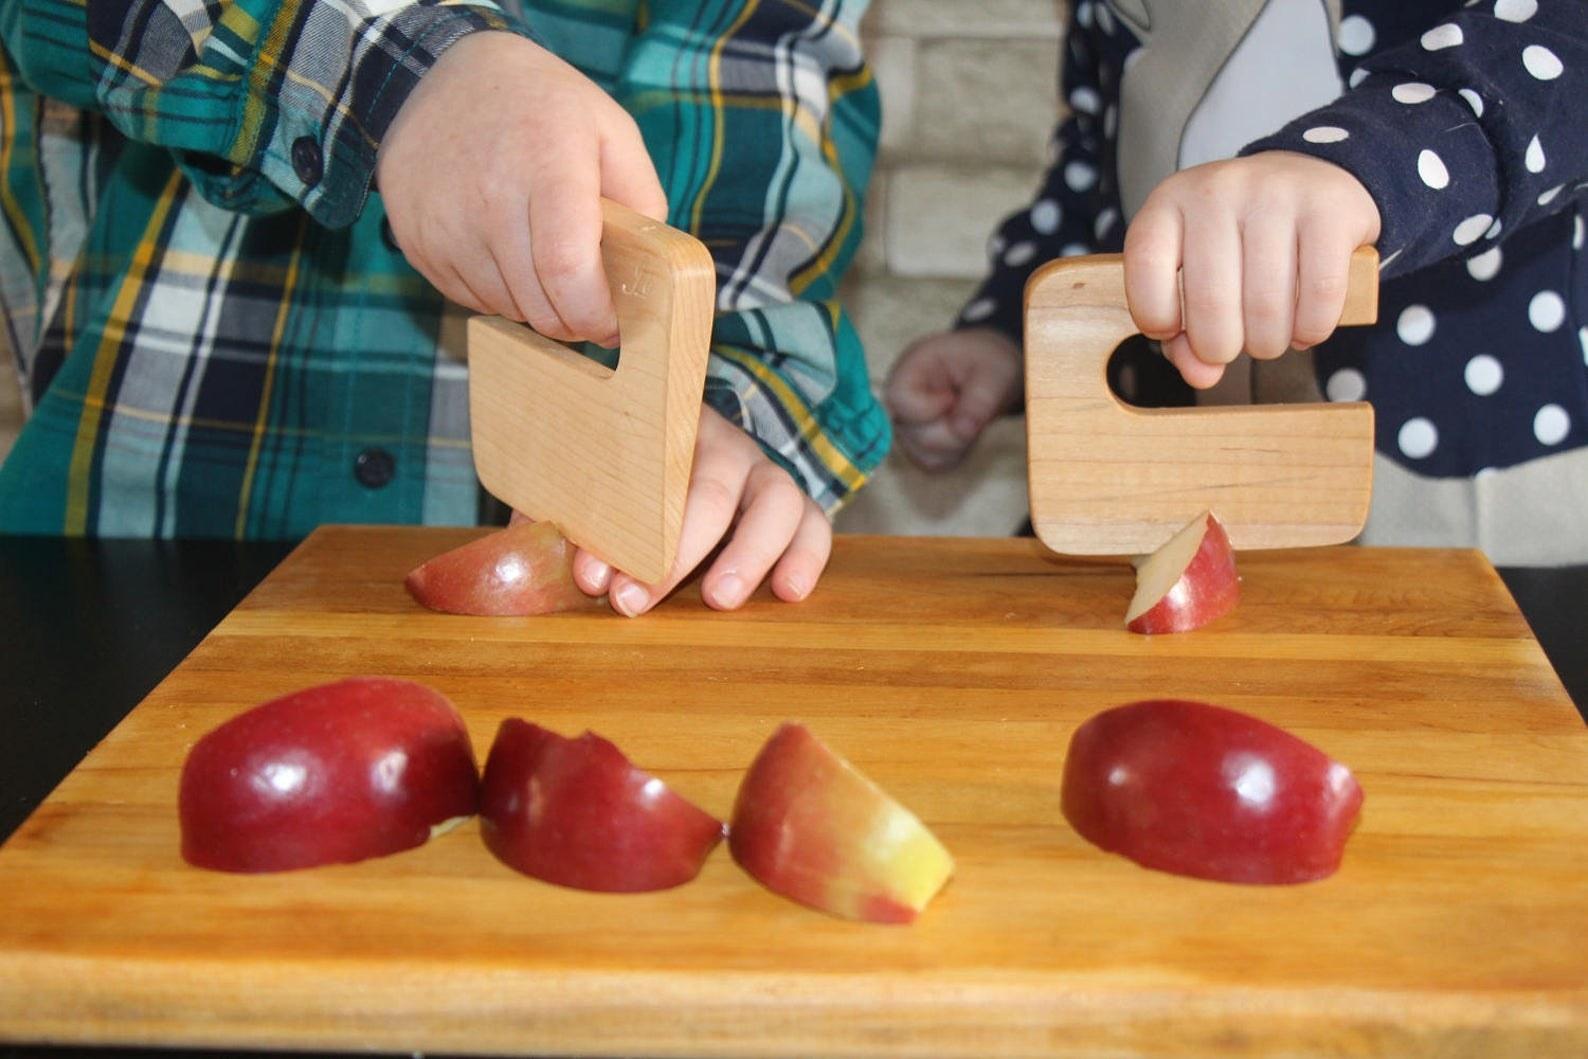 people using children safe wooden knife